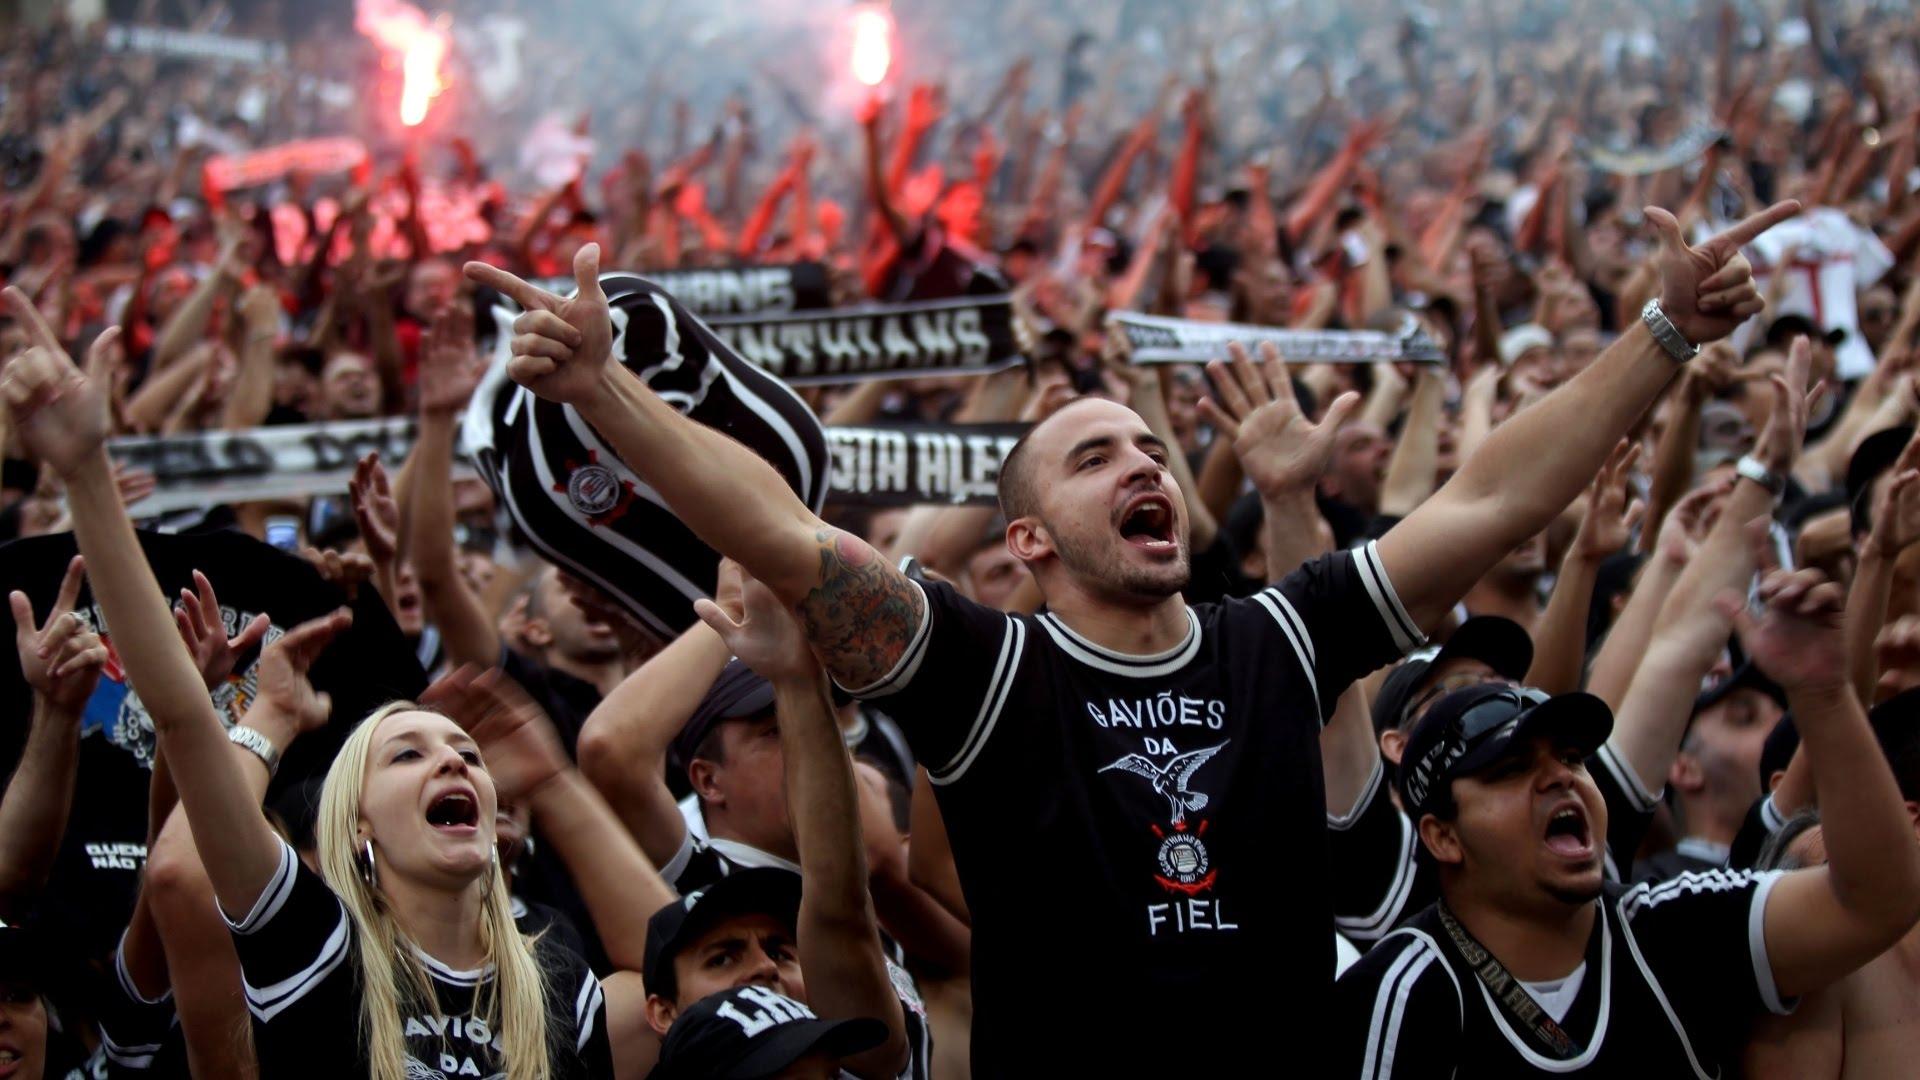 Campeonato Paulista, Corinthians-Ferroviaria: sfida equilibrata